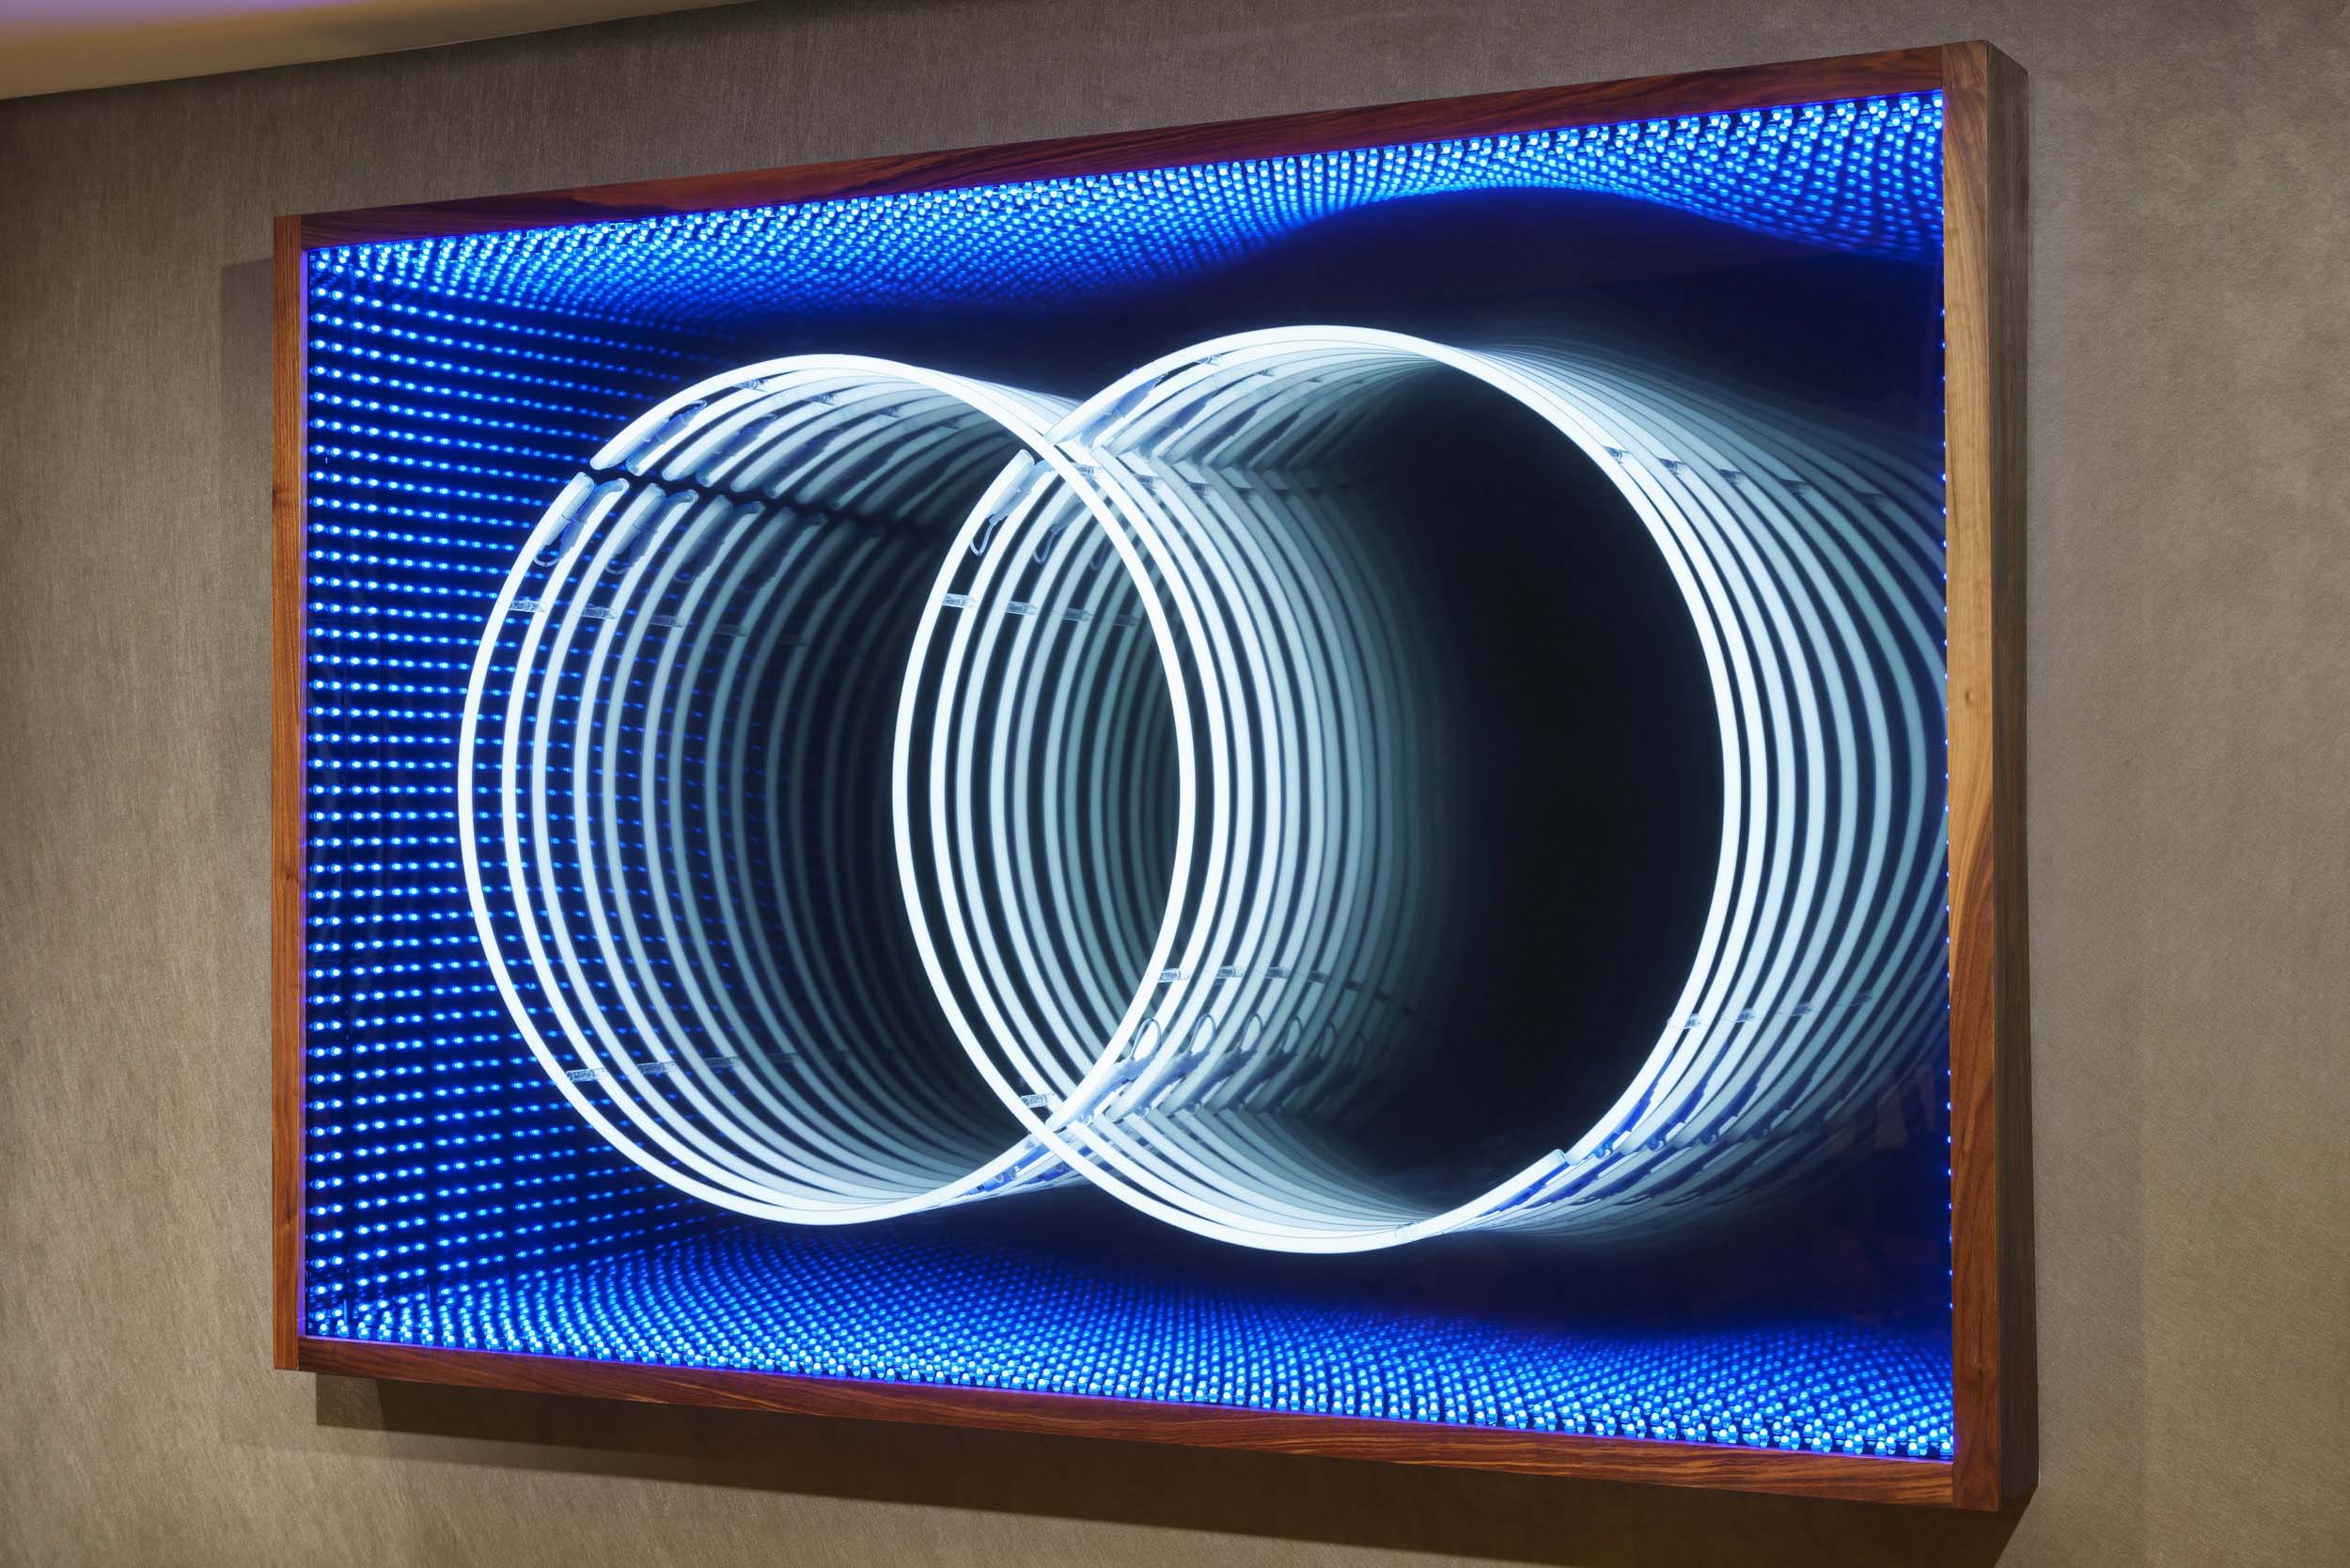 infinity-neon-lightbox-no.-2-by-sam-smyth.jpg